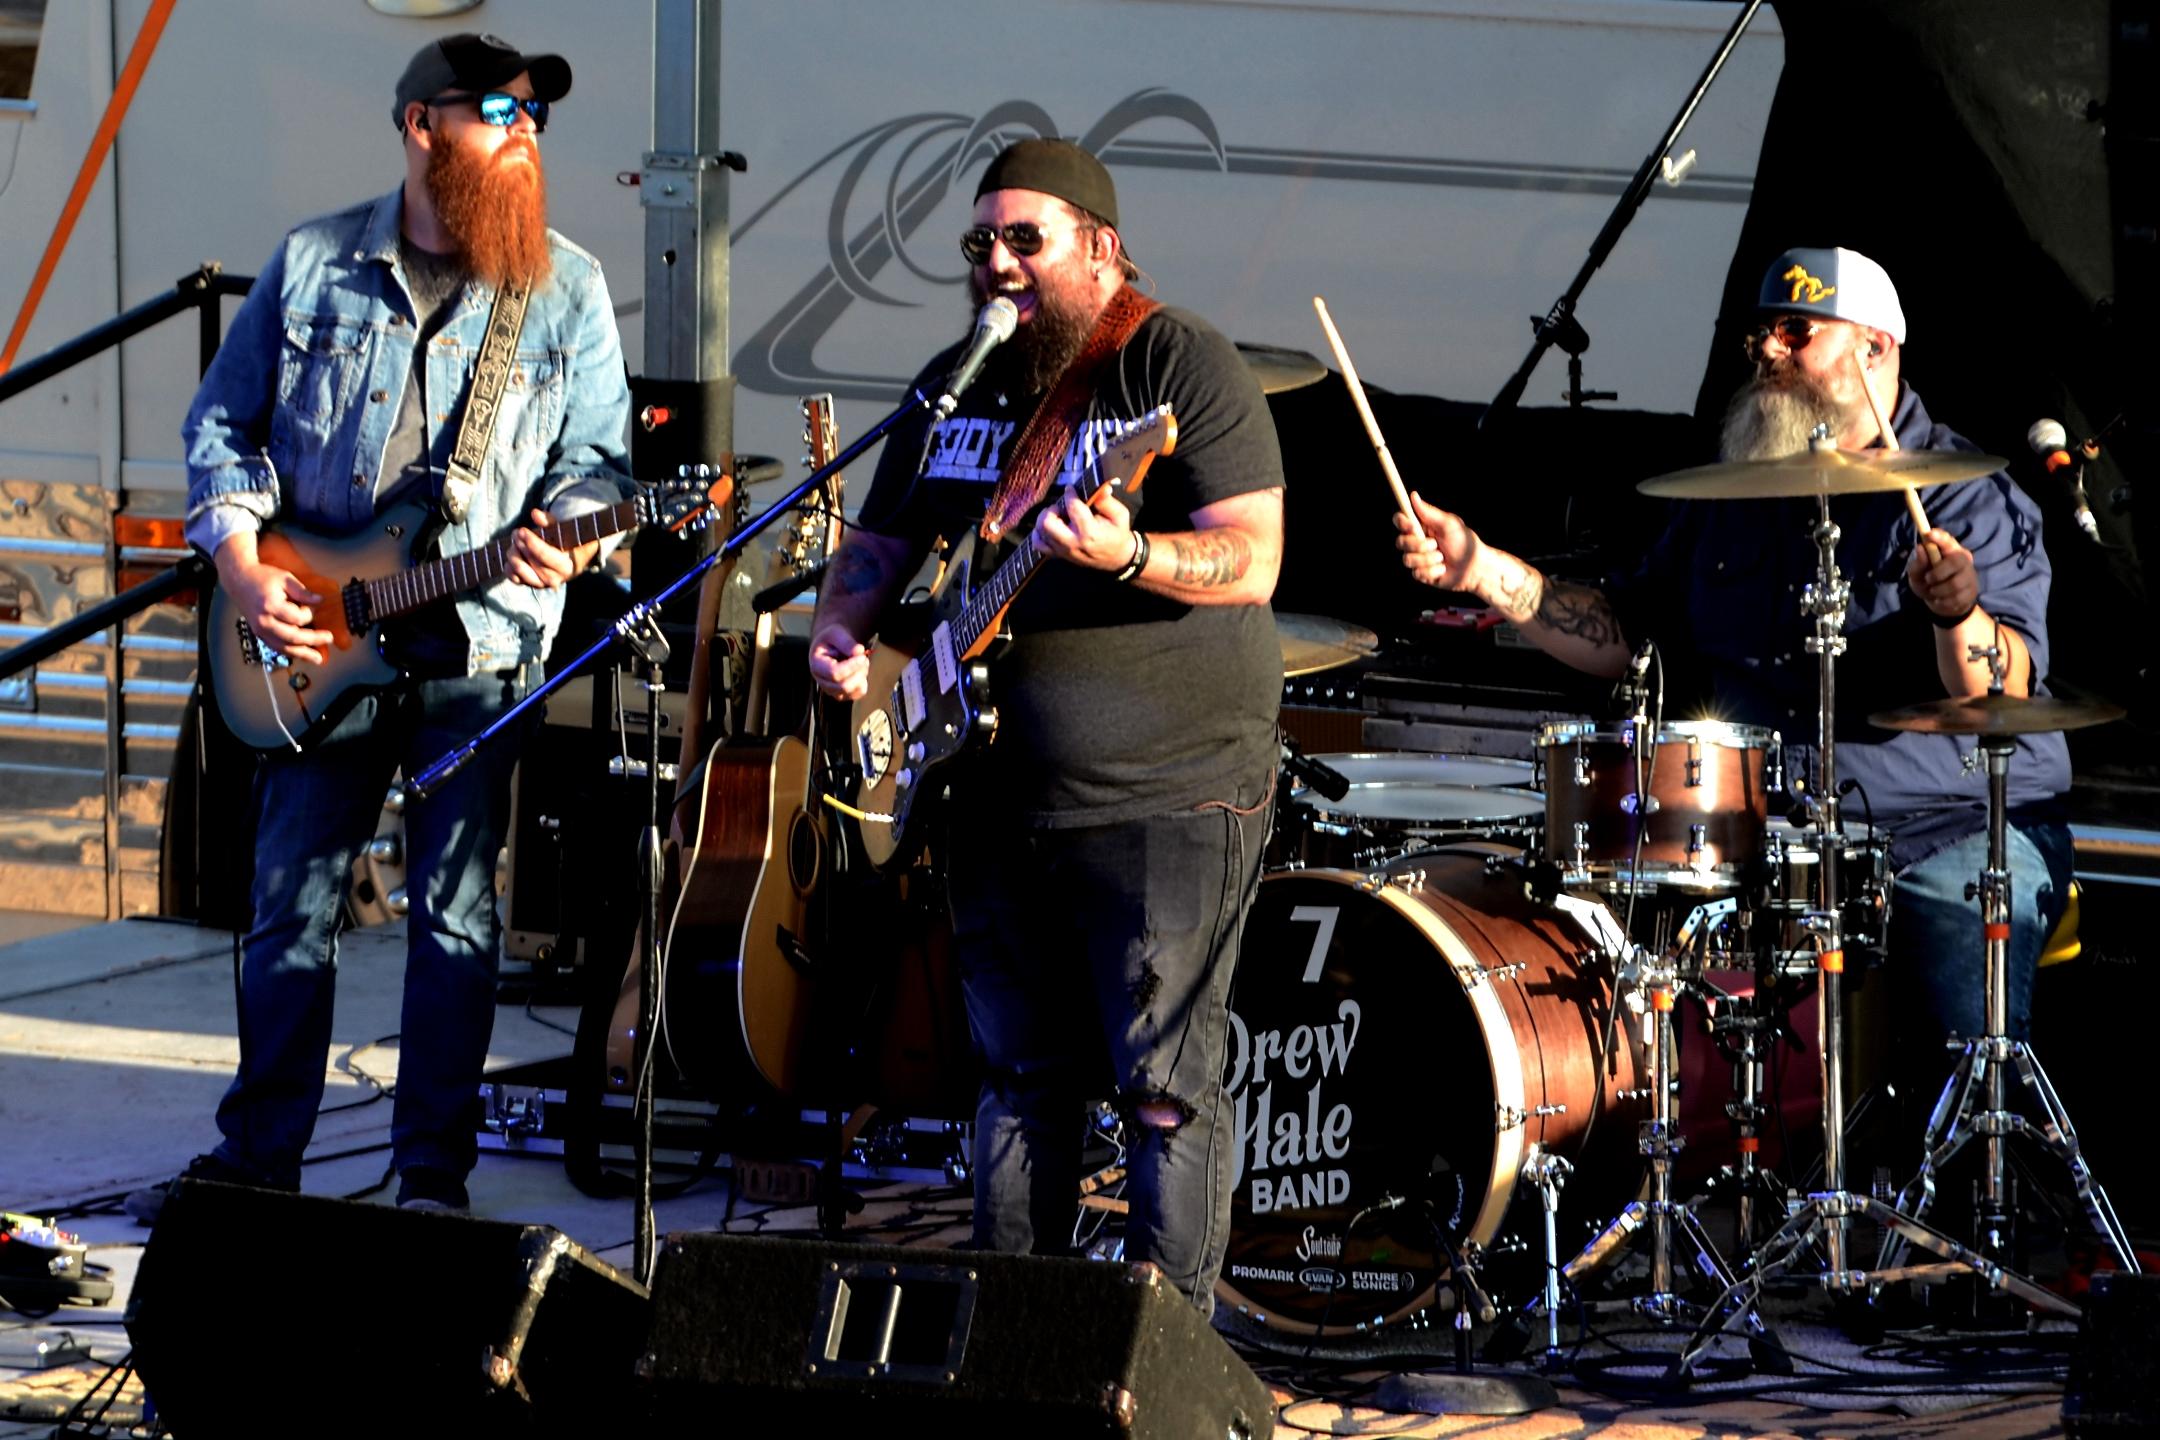 Drew Hale Band Photos